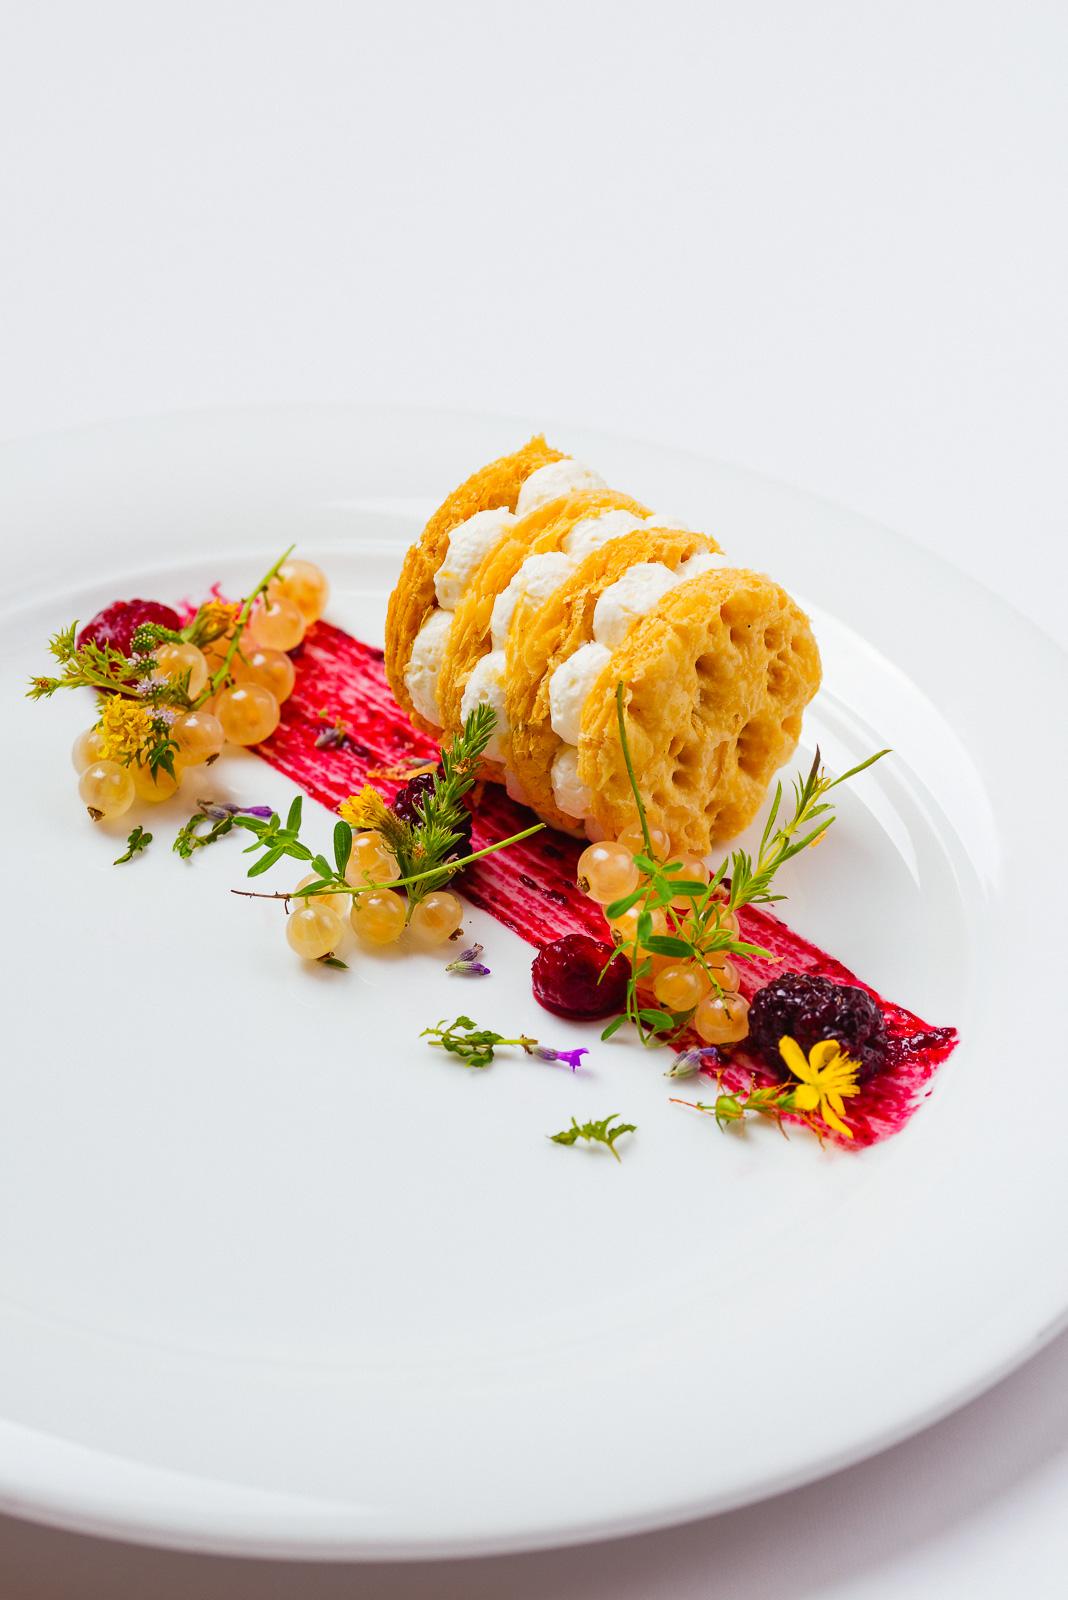 fotografia ristorante tenuta ippocrate avellino visual storytelling